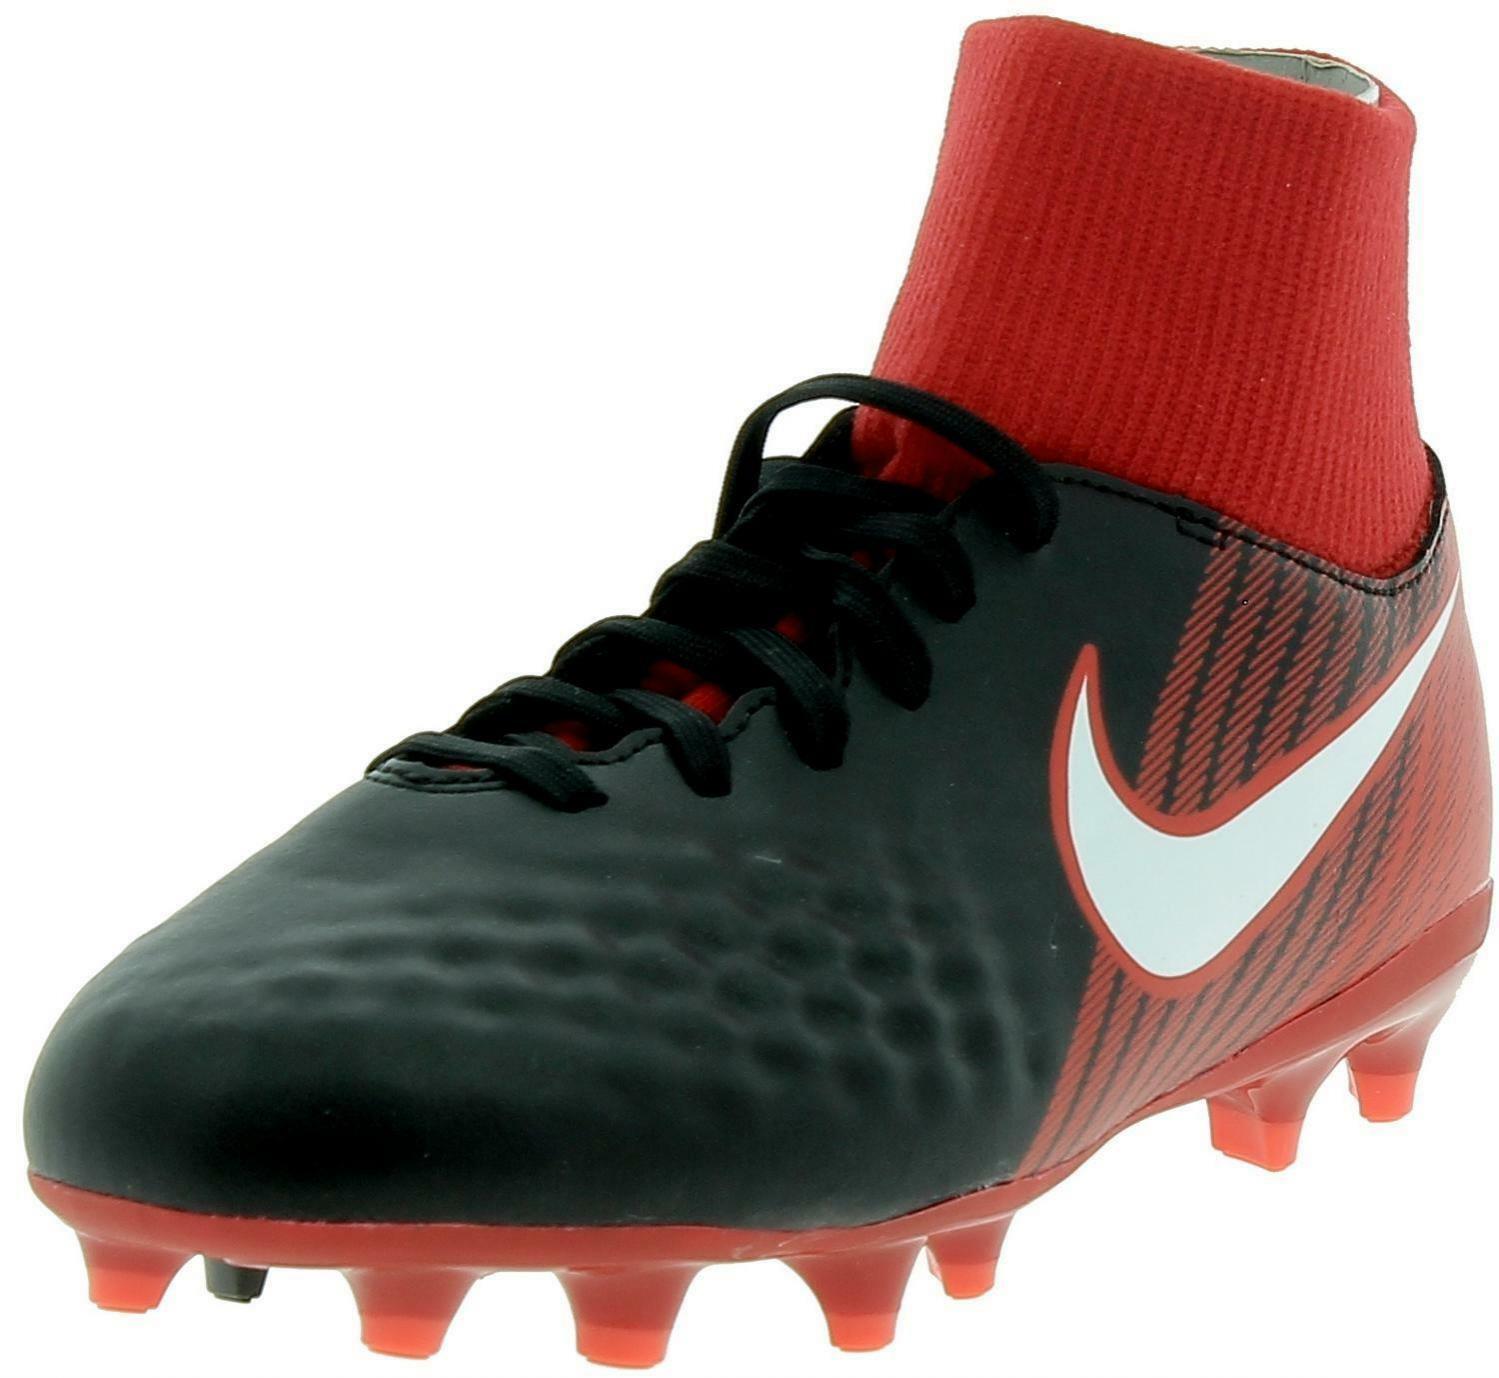 nike nike jr magista onda ii df fg scarpini calcio bambino nero rossi 917776061